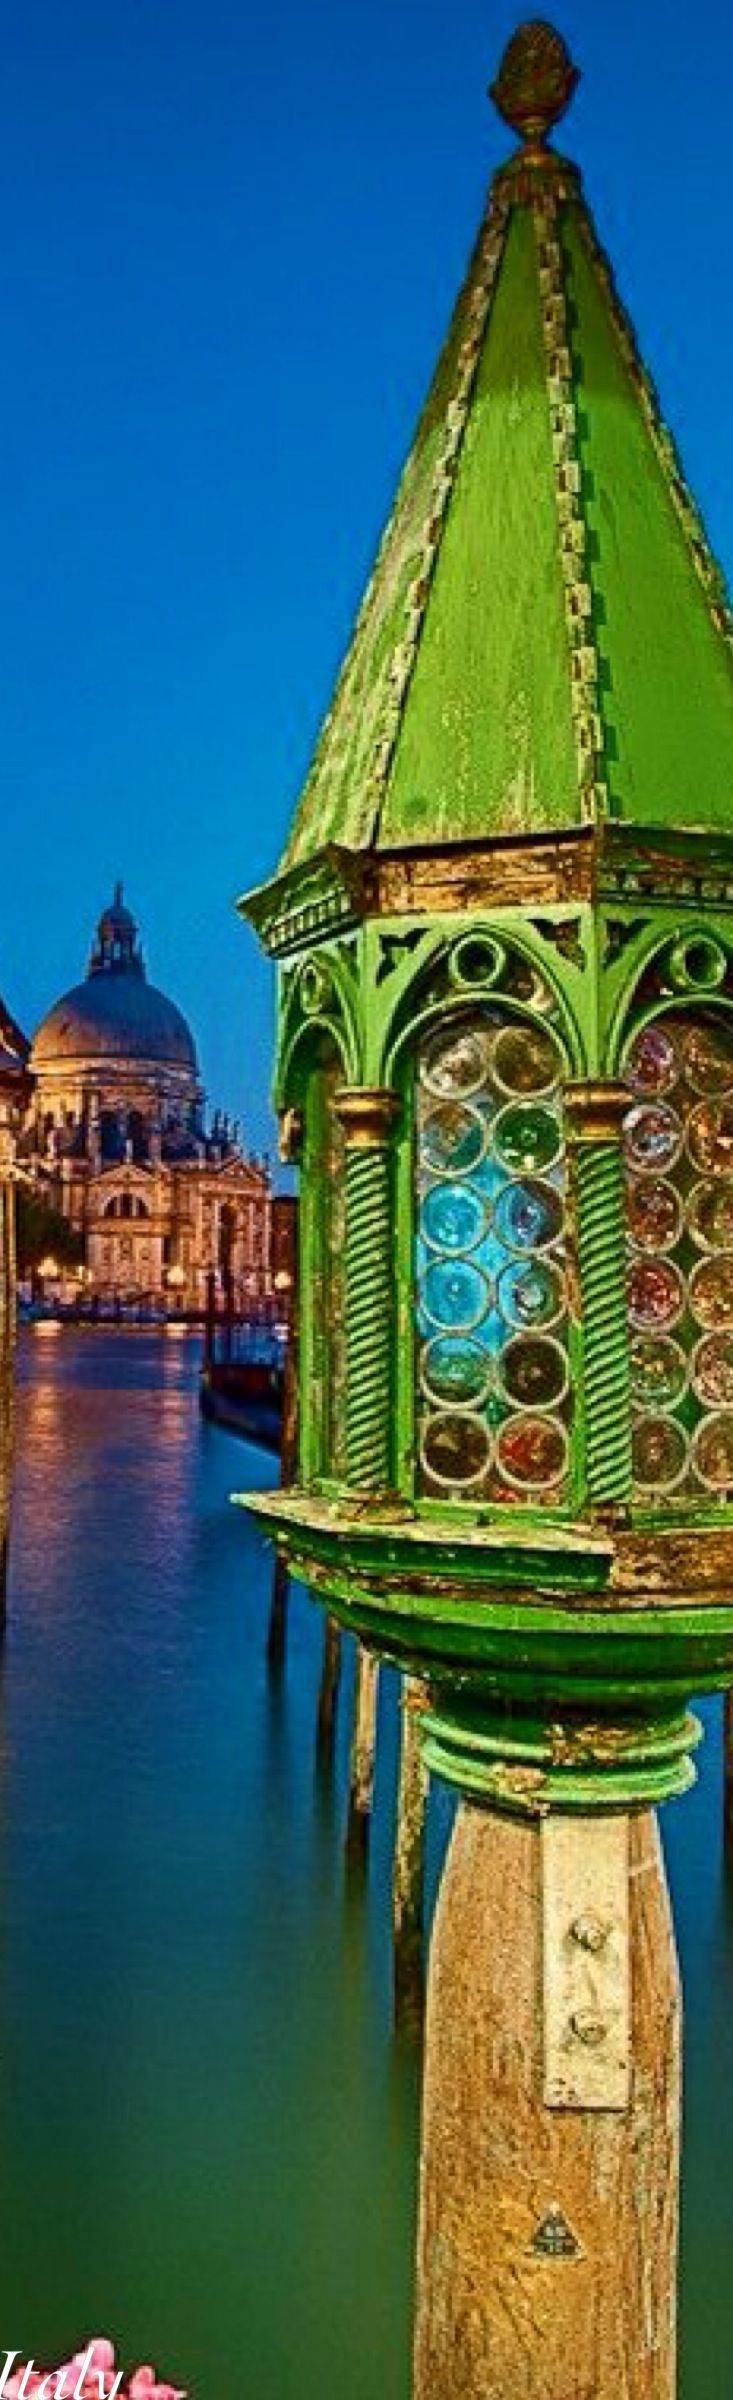 Italia Tour Italy| Serafini Amelia| ● ♔ Venice, ITALY ♔